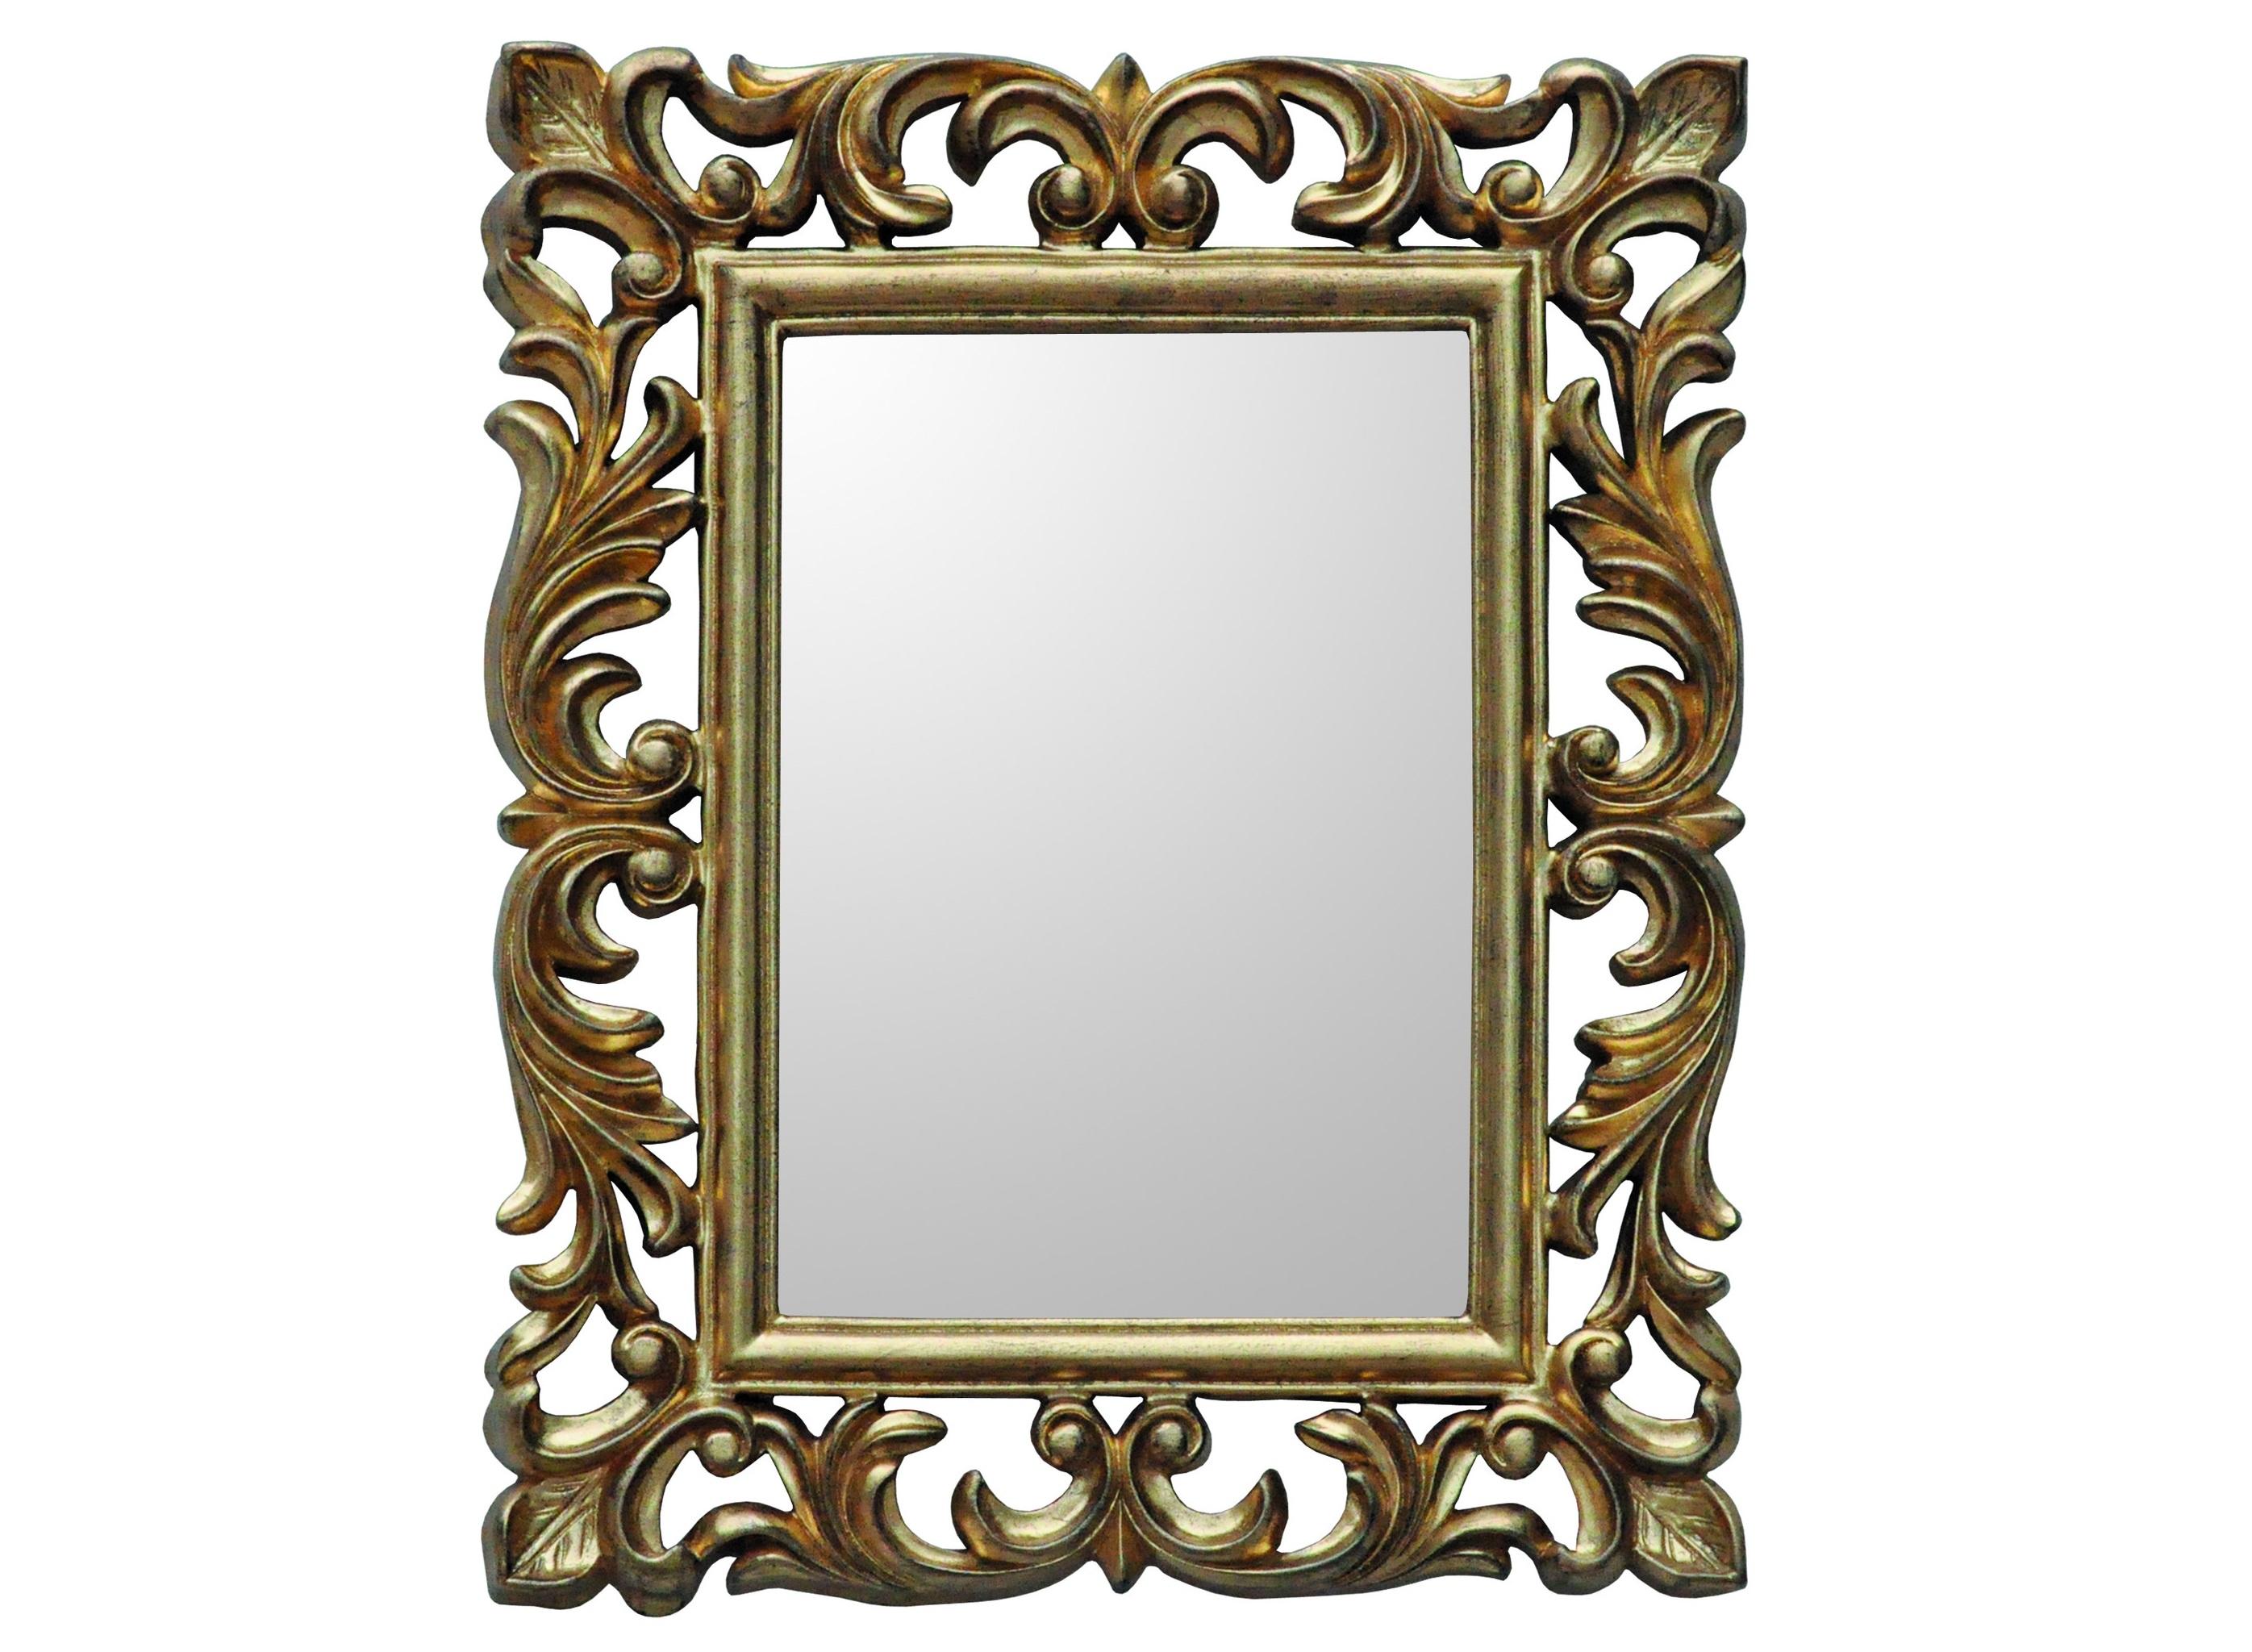 Зеркало GrapeНастенные зеркала<br>Материал: полистоун, стекло<br><br>Material: Пластик<br>Width см: 40<br>Depth см: 2<br>Height см: 50